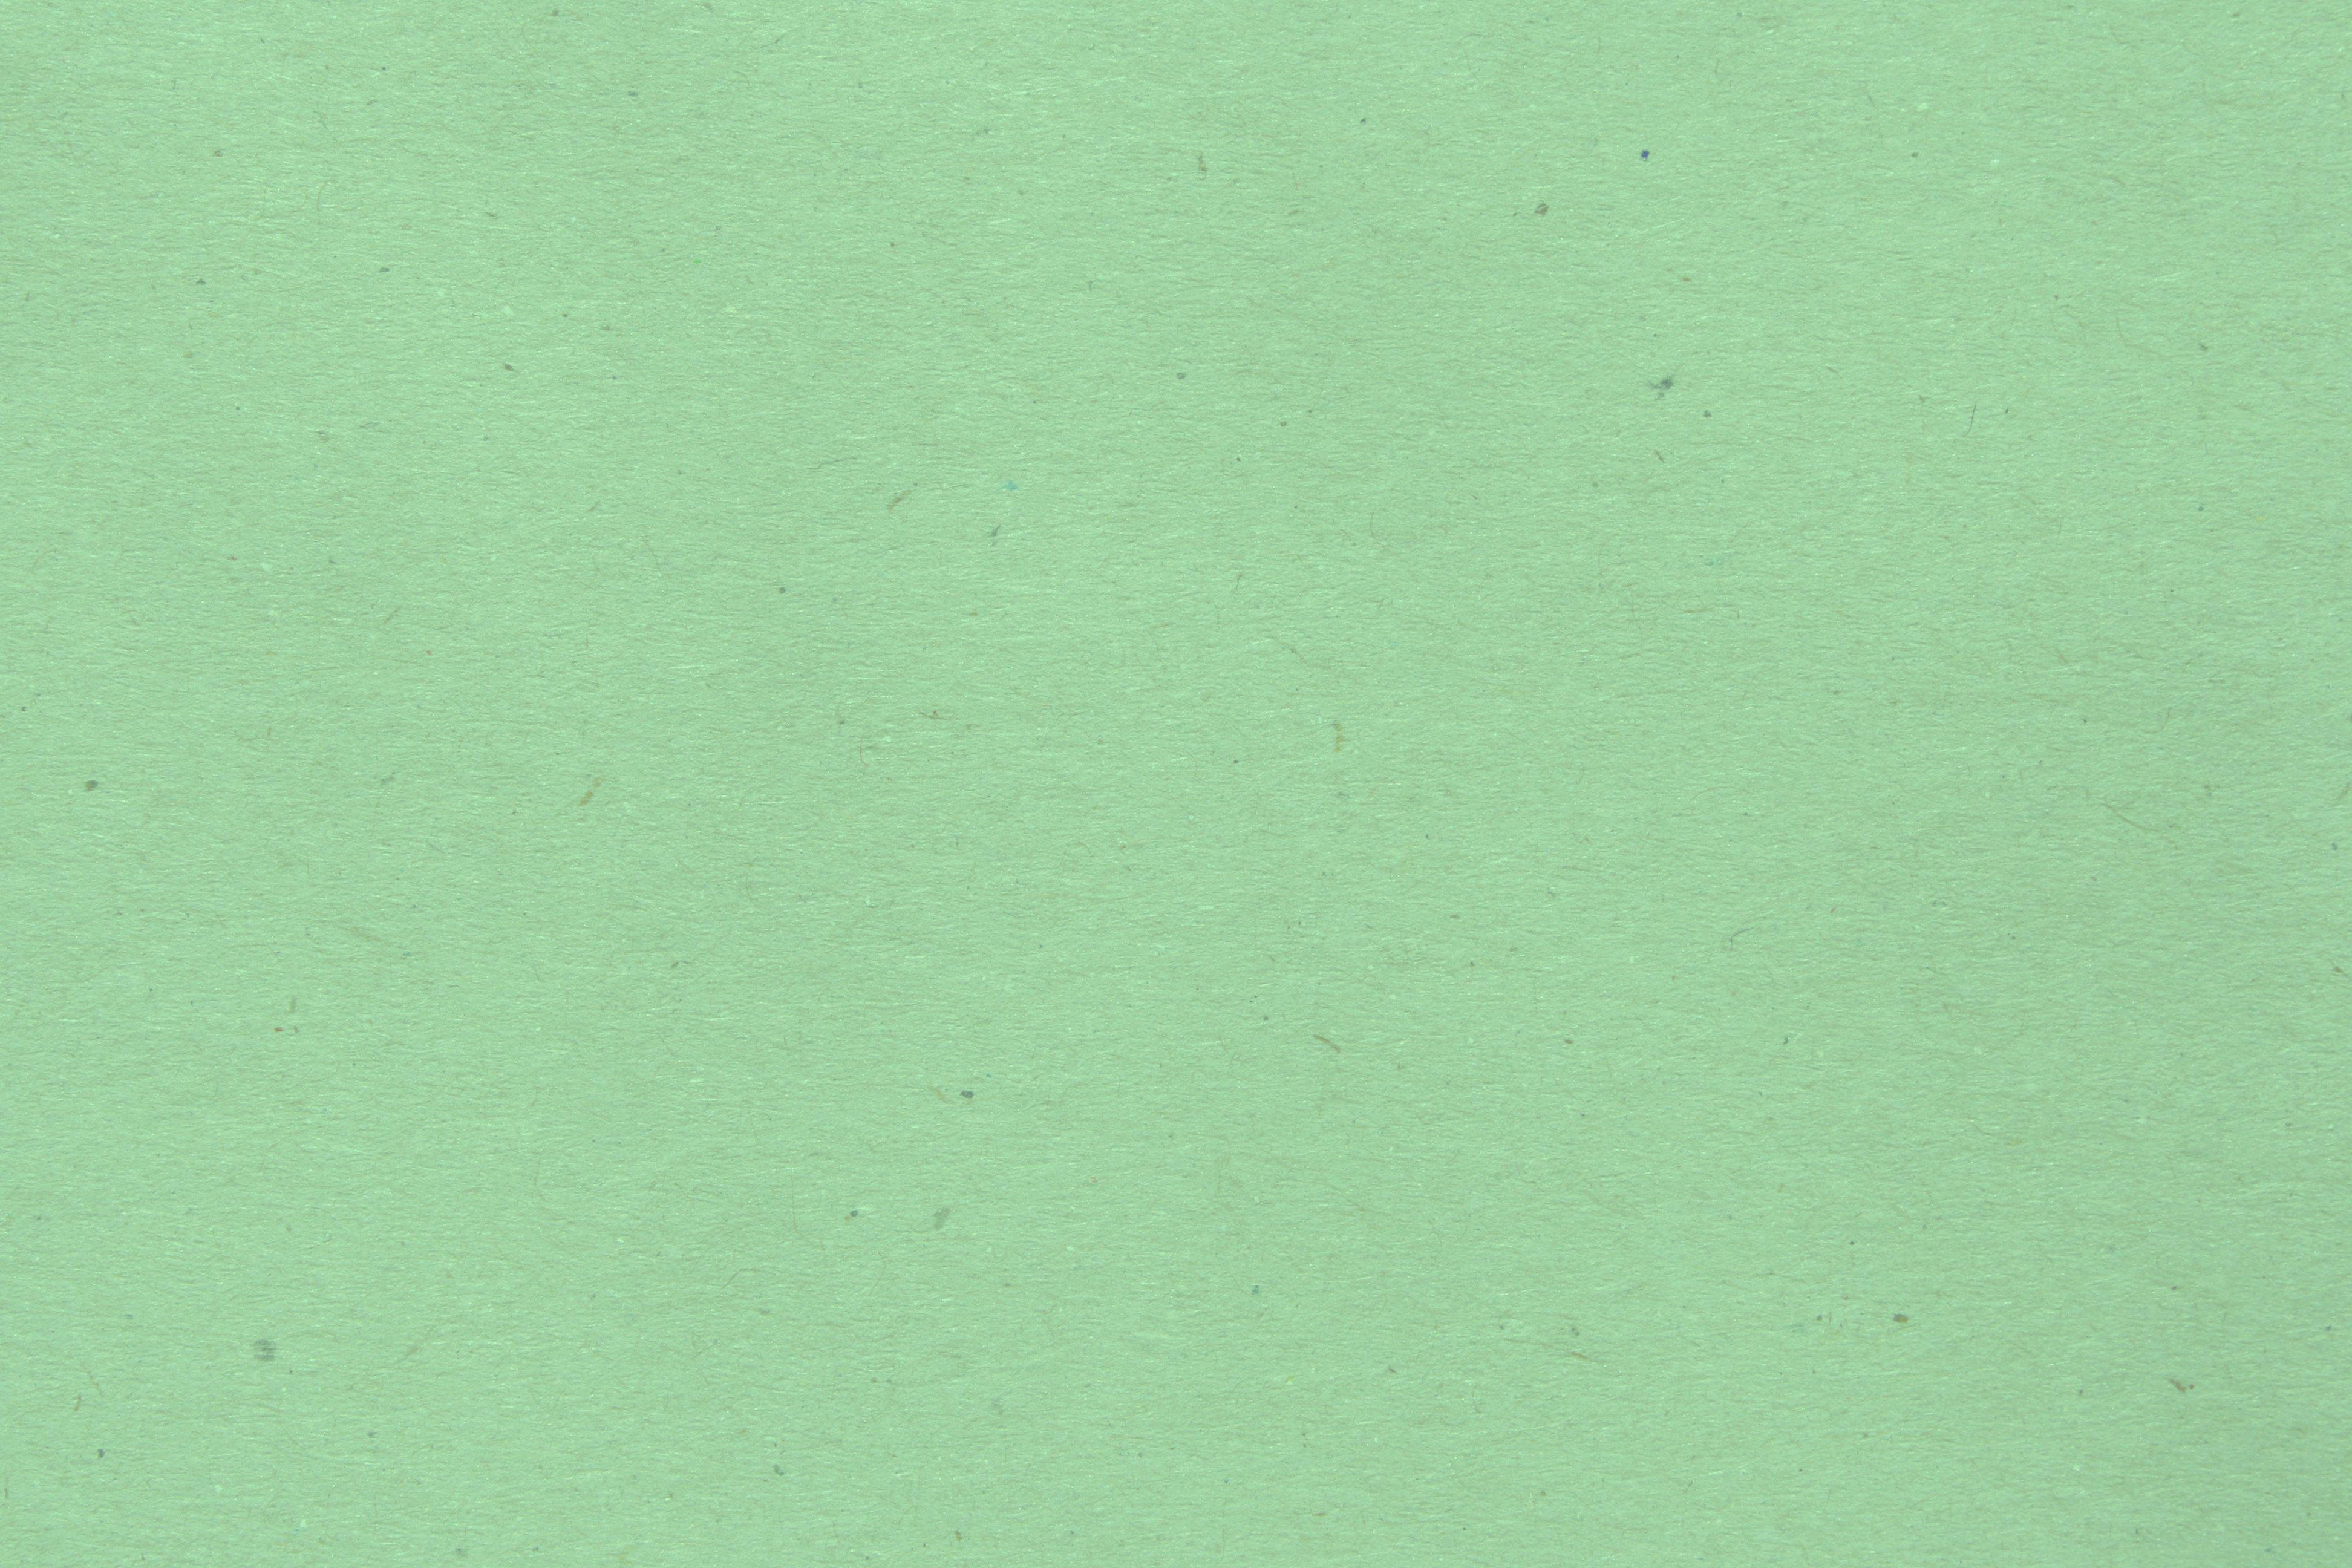 Mint Green Paper Texture Picture | Free Photograph | Photos Public ...